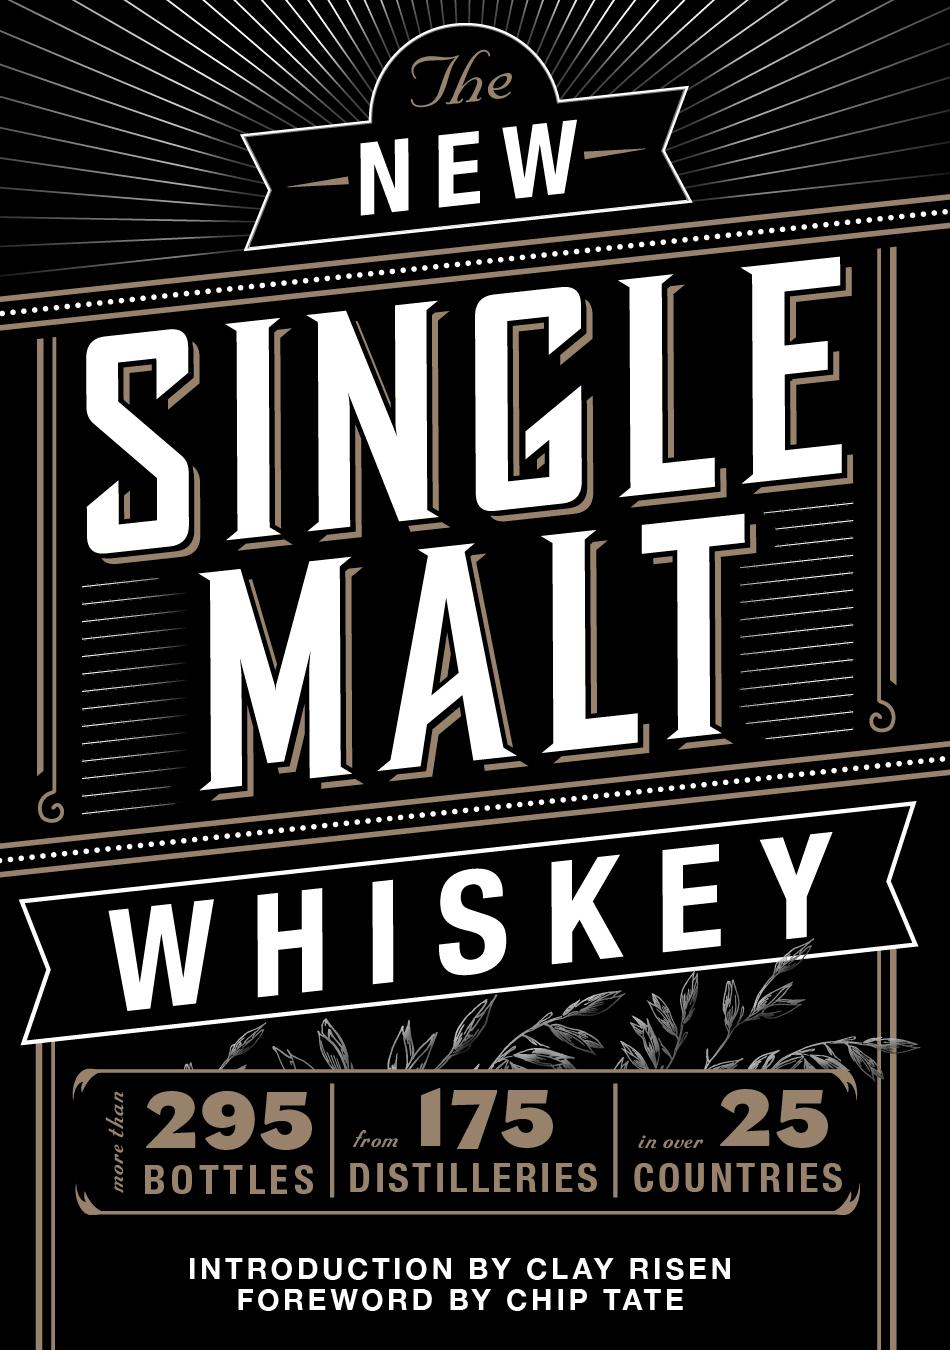 east coast wineries gotham single malt whiskey new york produces